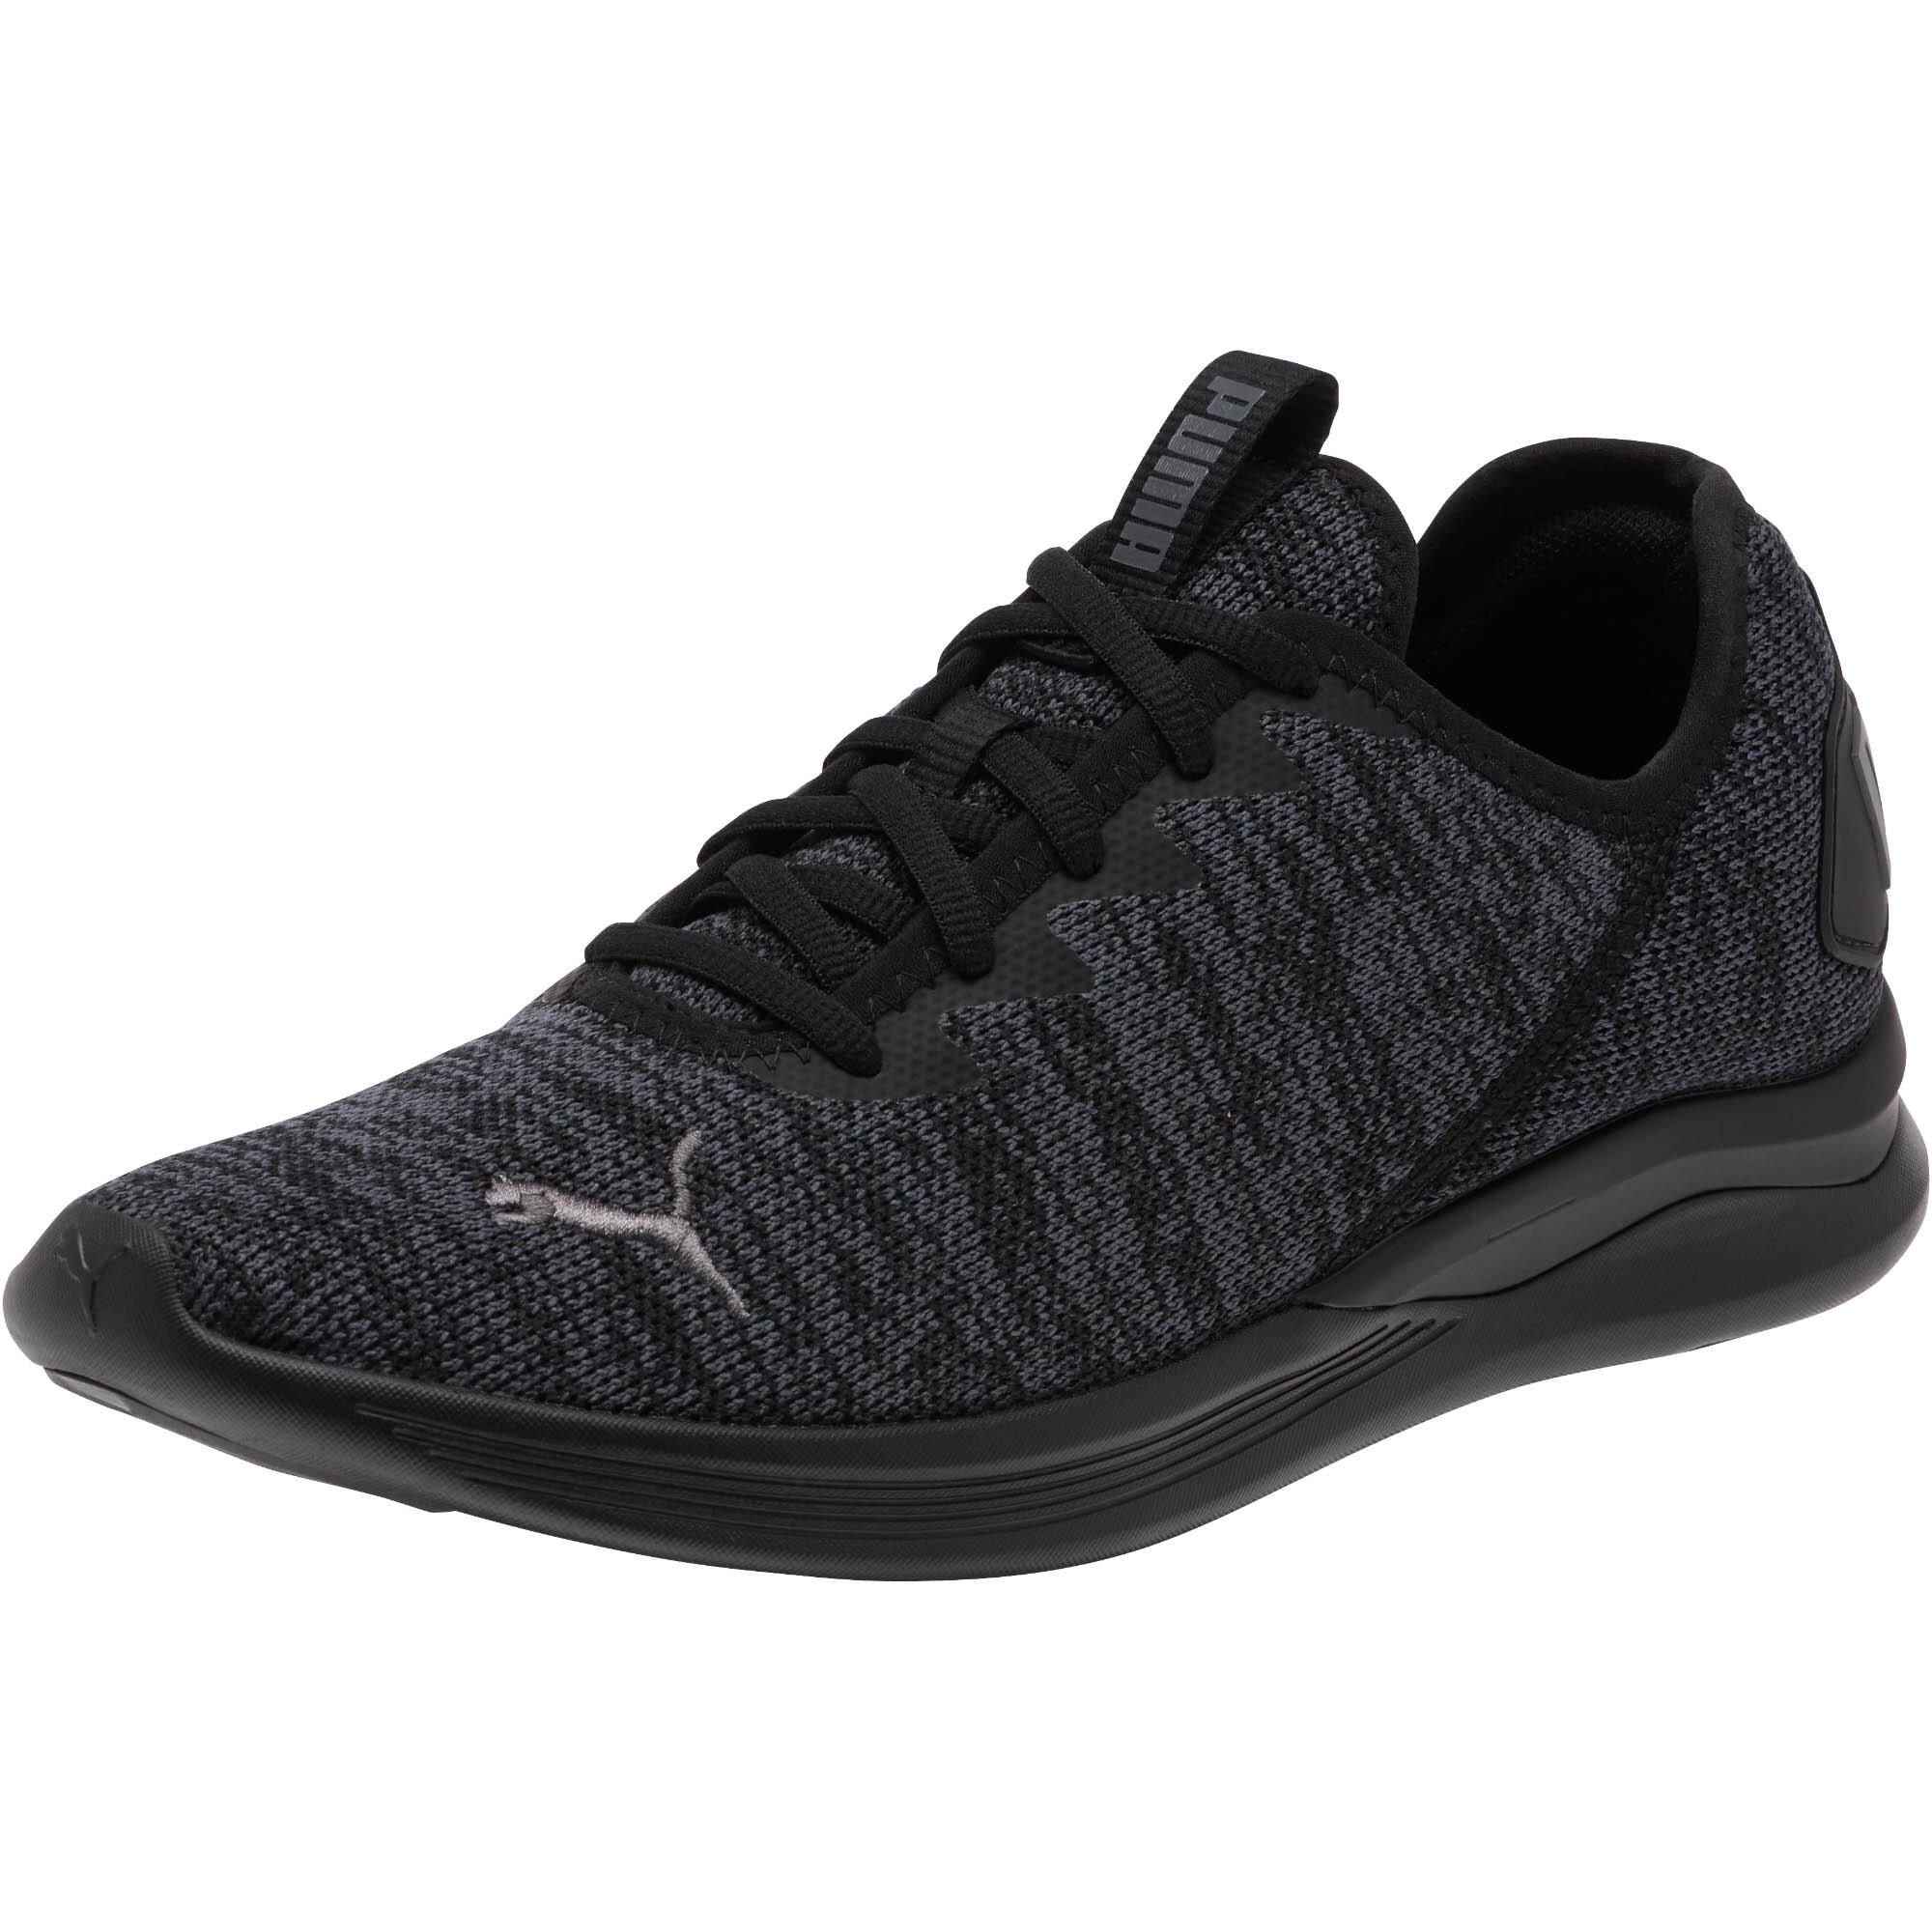 PUMA-Ballast-Men-039-s-Running-Shoes-Men-Shoe-Running thumbnail 16